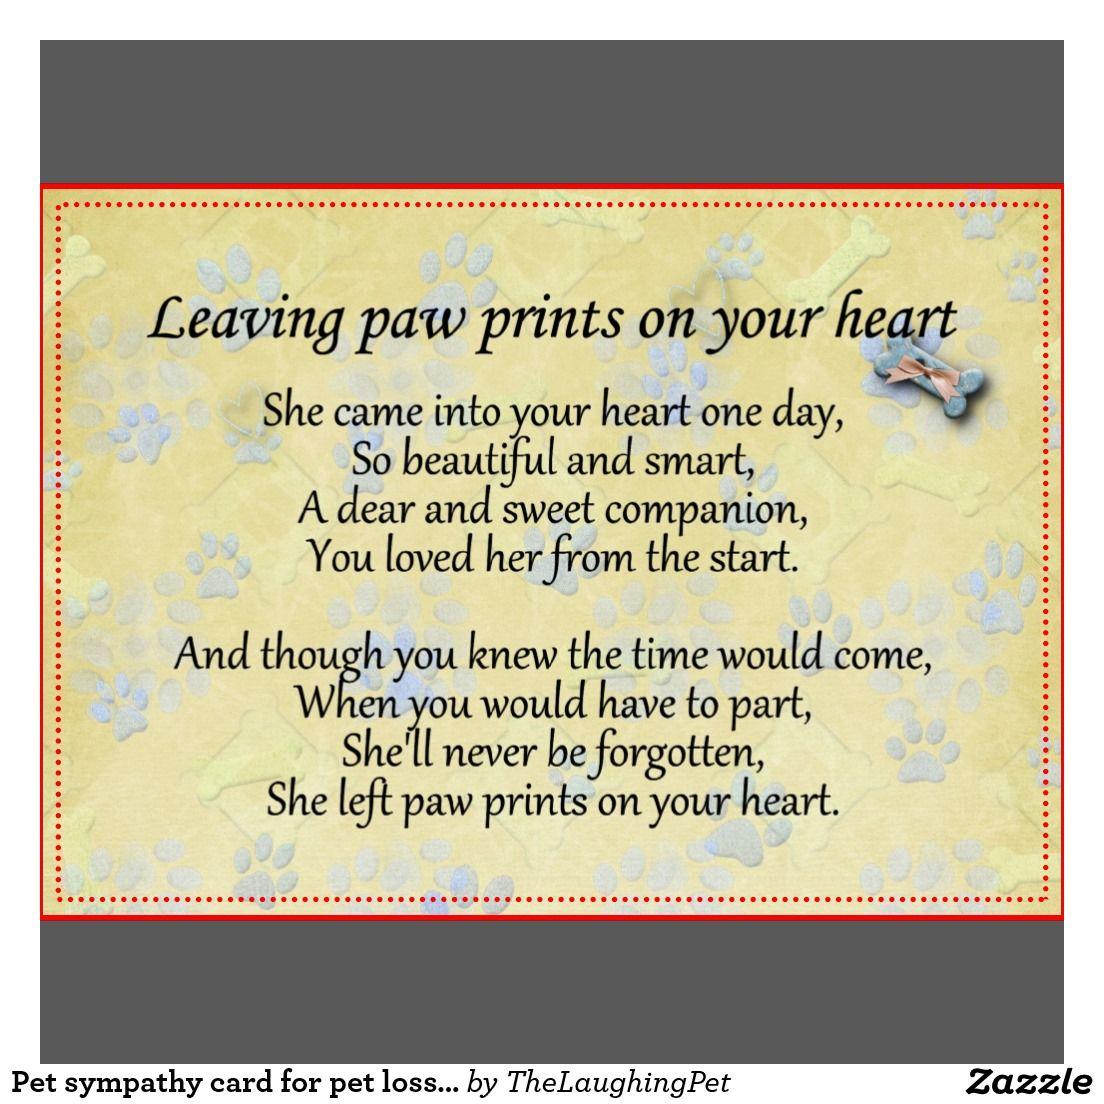 image about Rainbow Bridge Poem Printable Version referred to as Rainbow Bridge Memorial Poem For Canine Poster: Rainbow Bridge